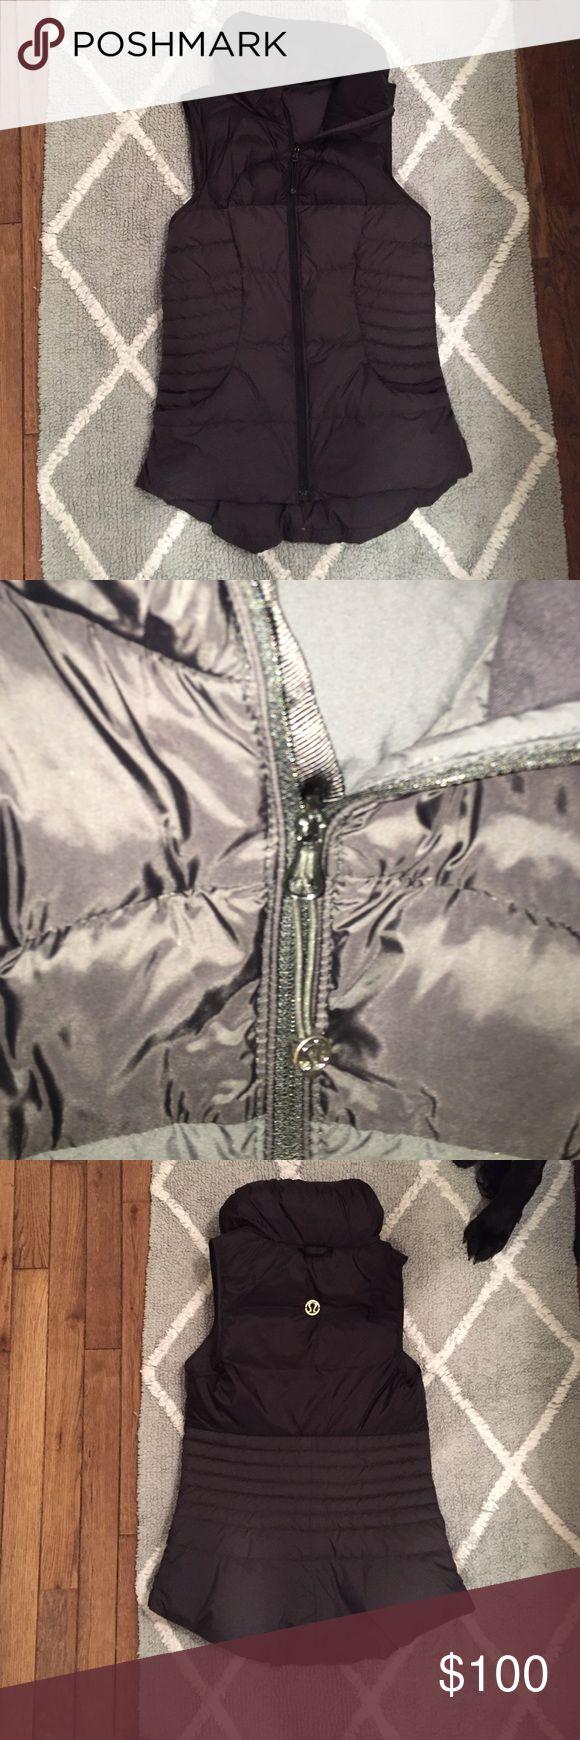 Best 25+ Lululemon vest ideas on Pinterest | Winter workout ...